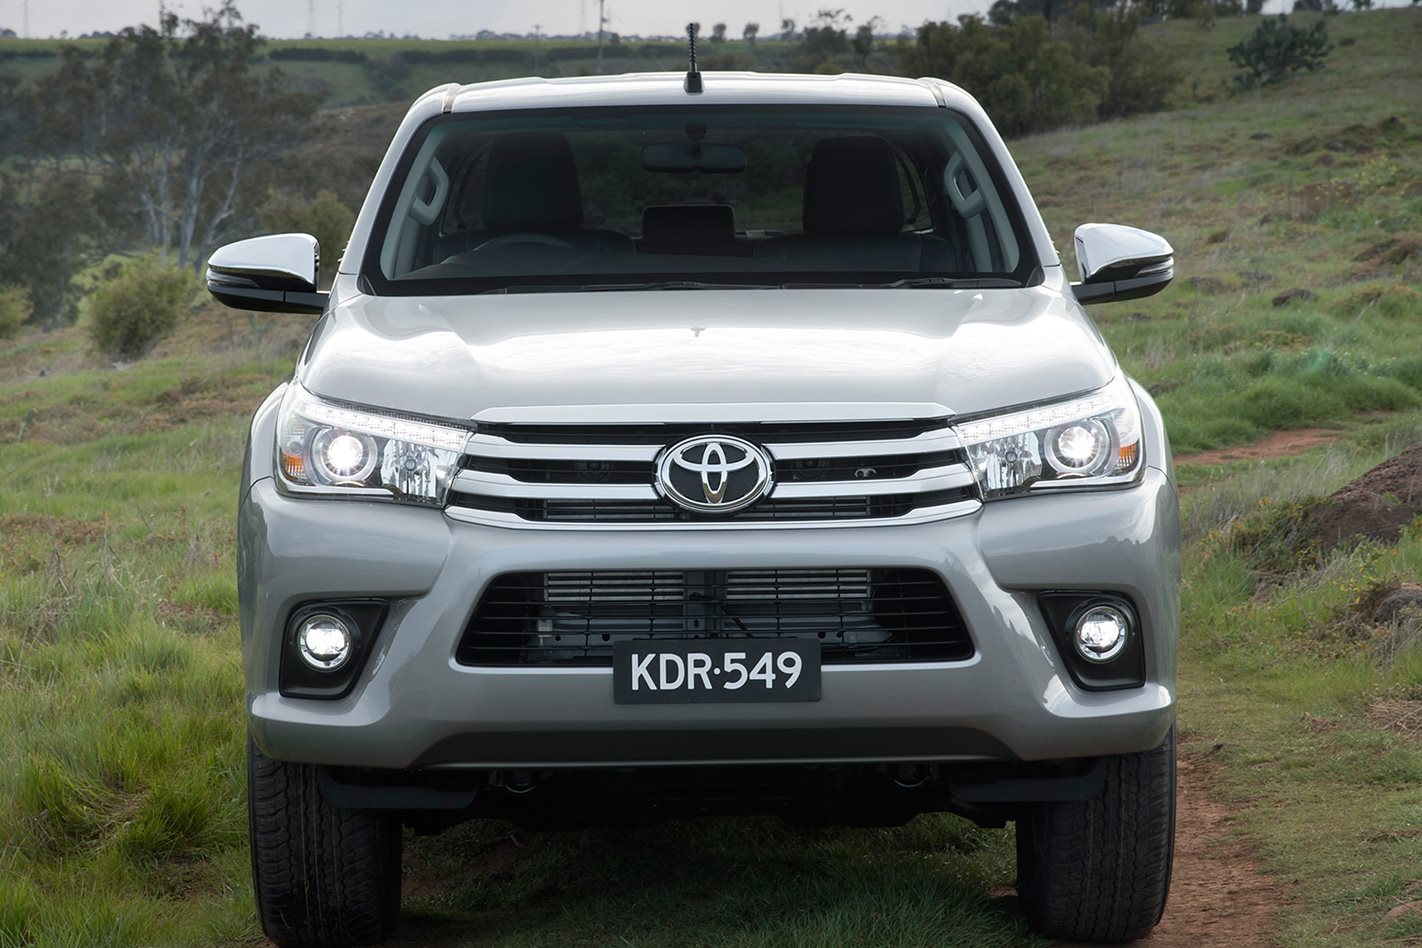 2018-Toyota-Hilux-SR5+-front.jpg